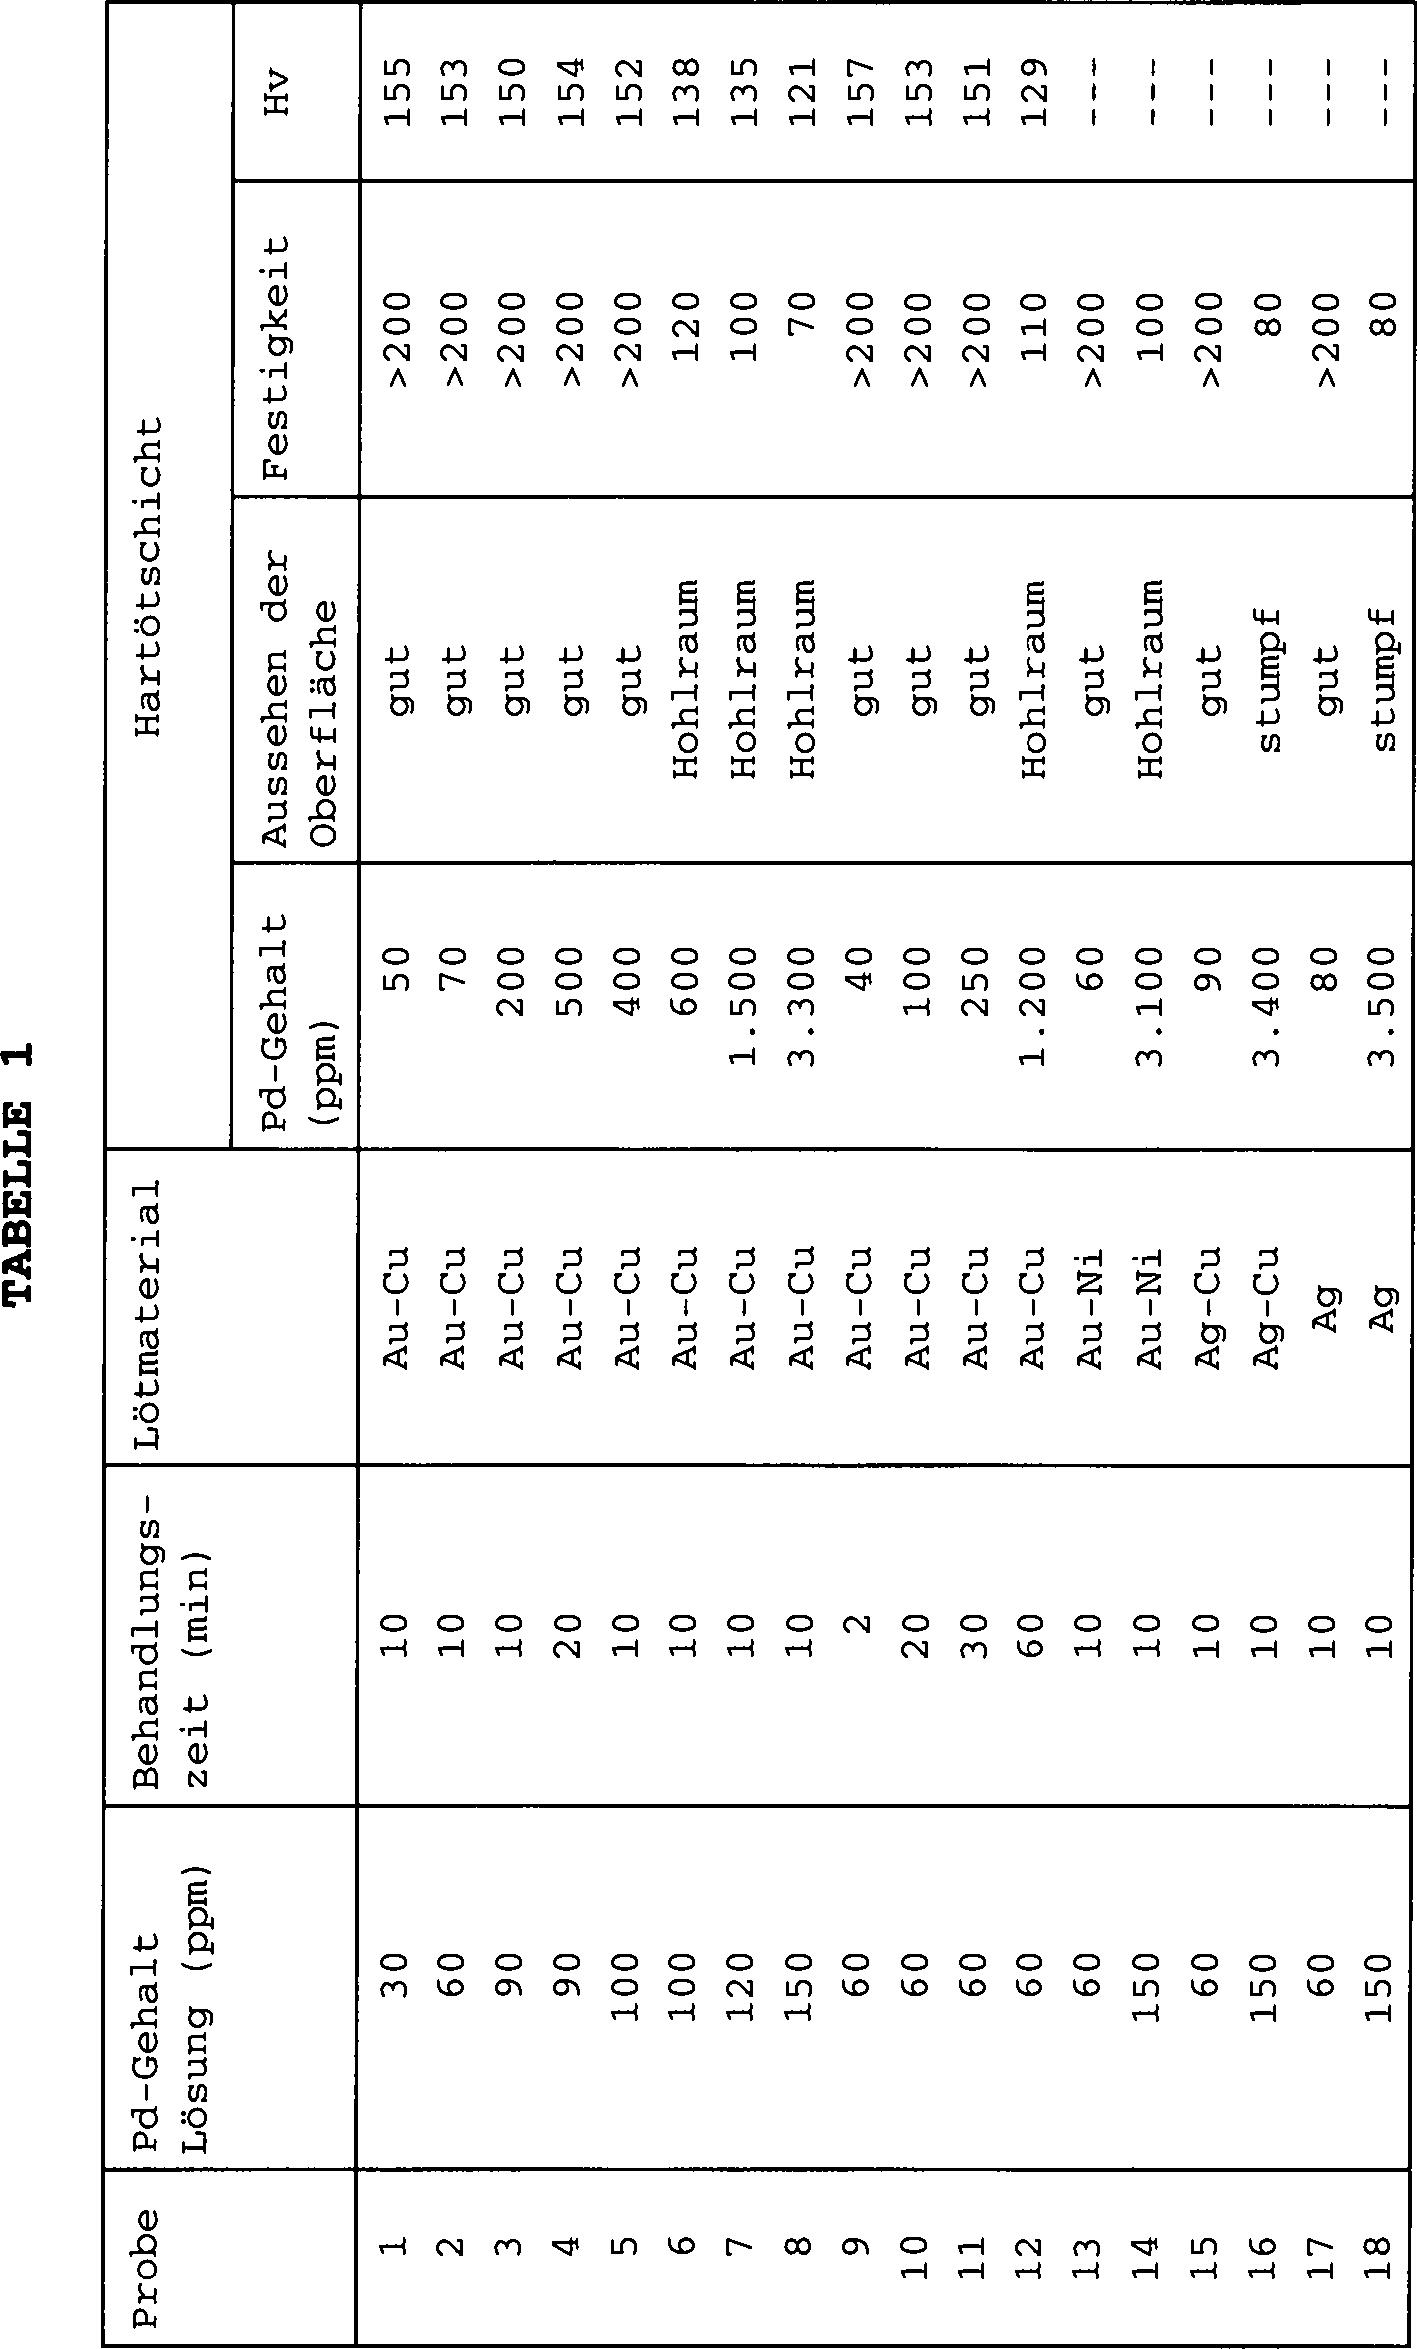 Beste Gegen Schaltplan Ideen - Der Schaltplan - triangre.info